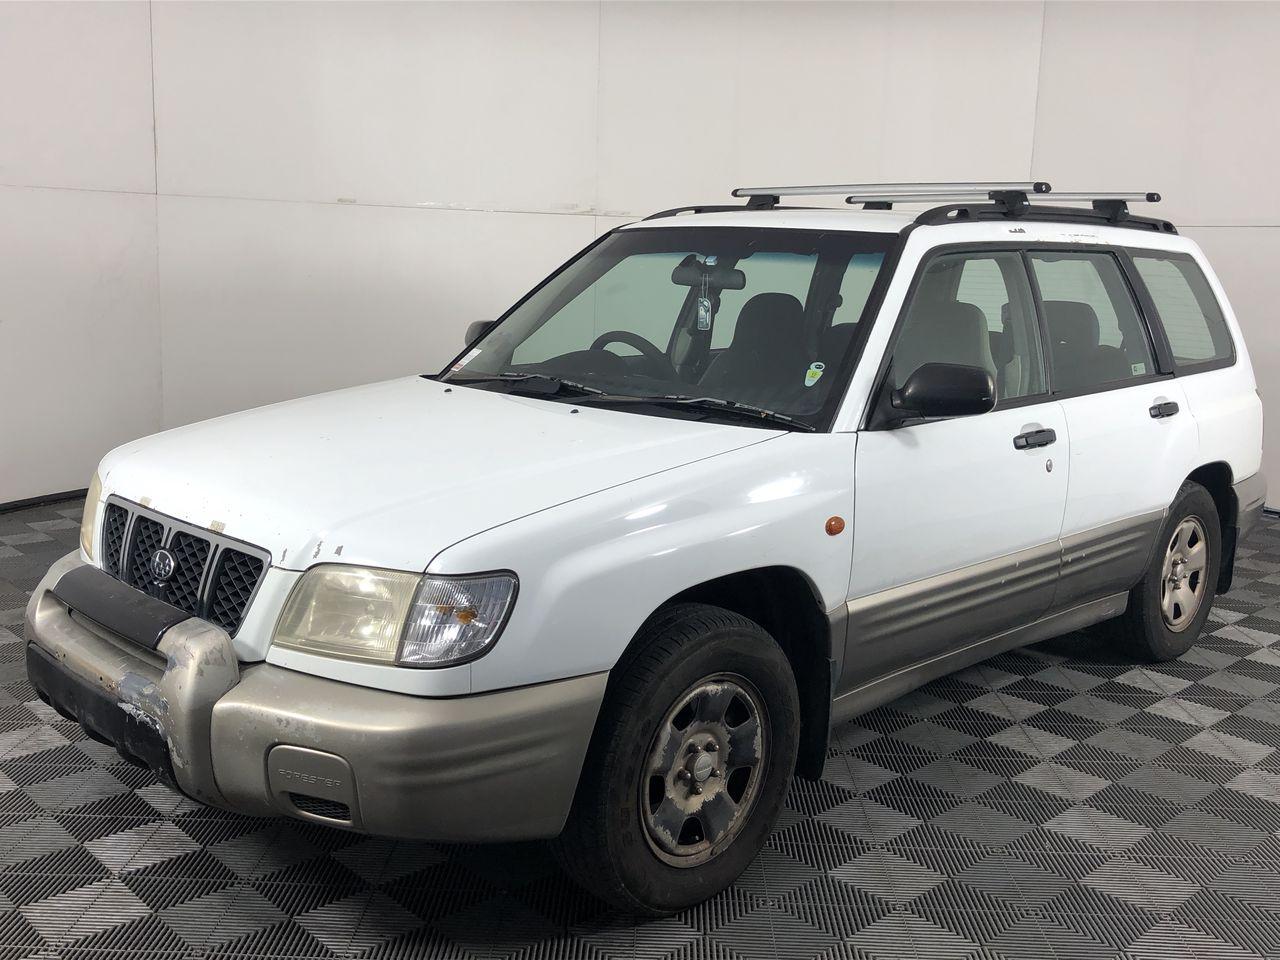 2001 Subaru Forester Limited Automatic Wagon